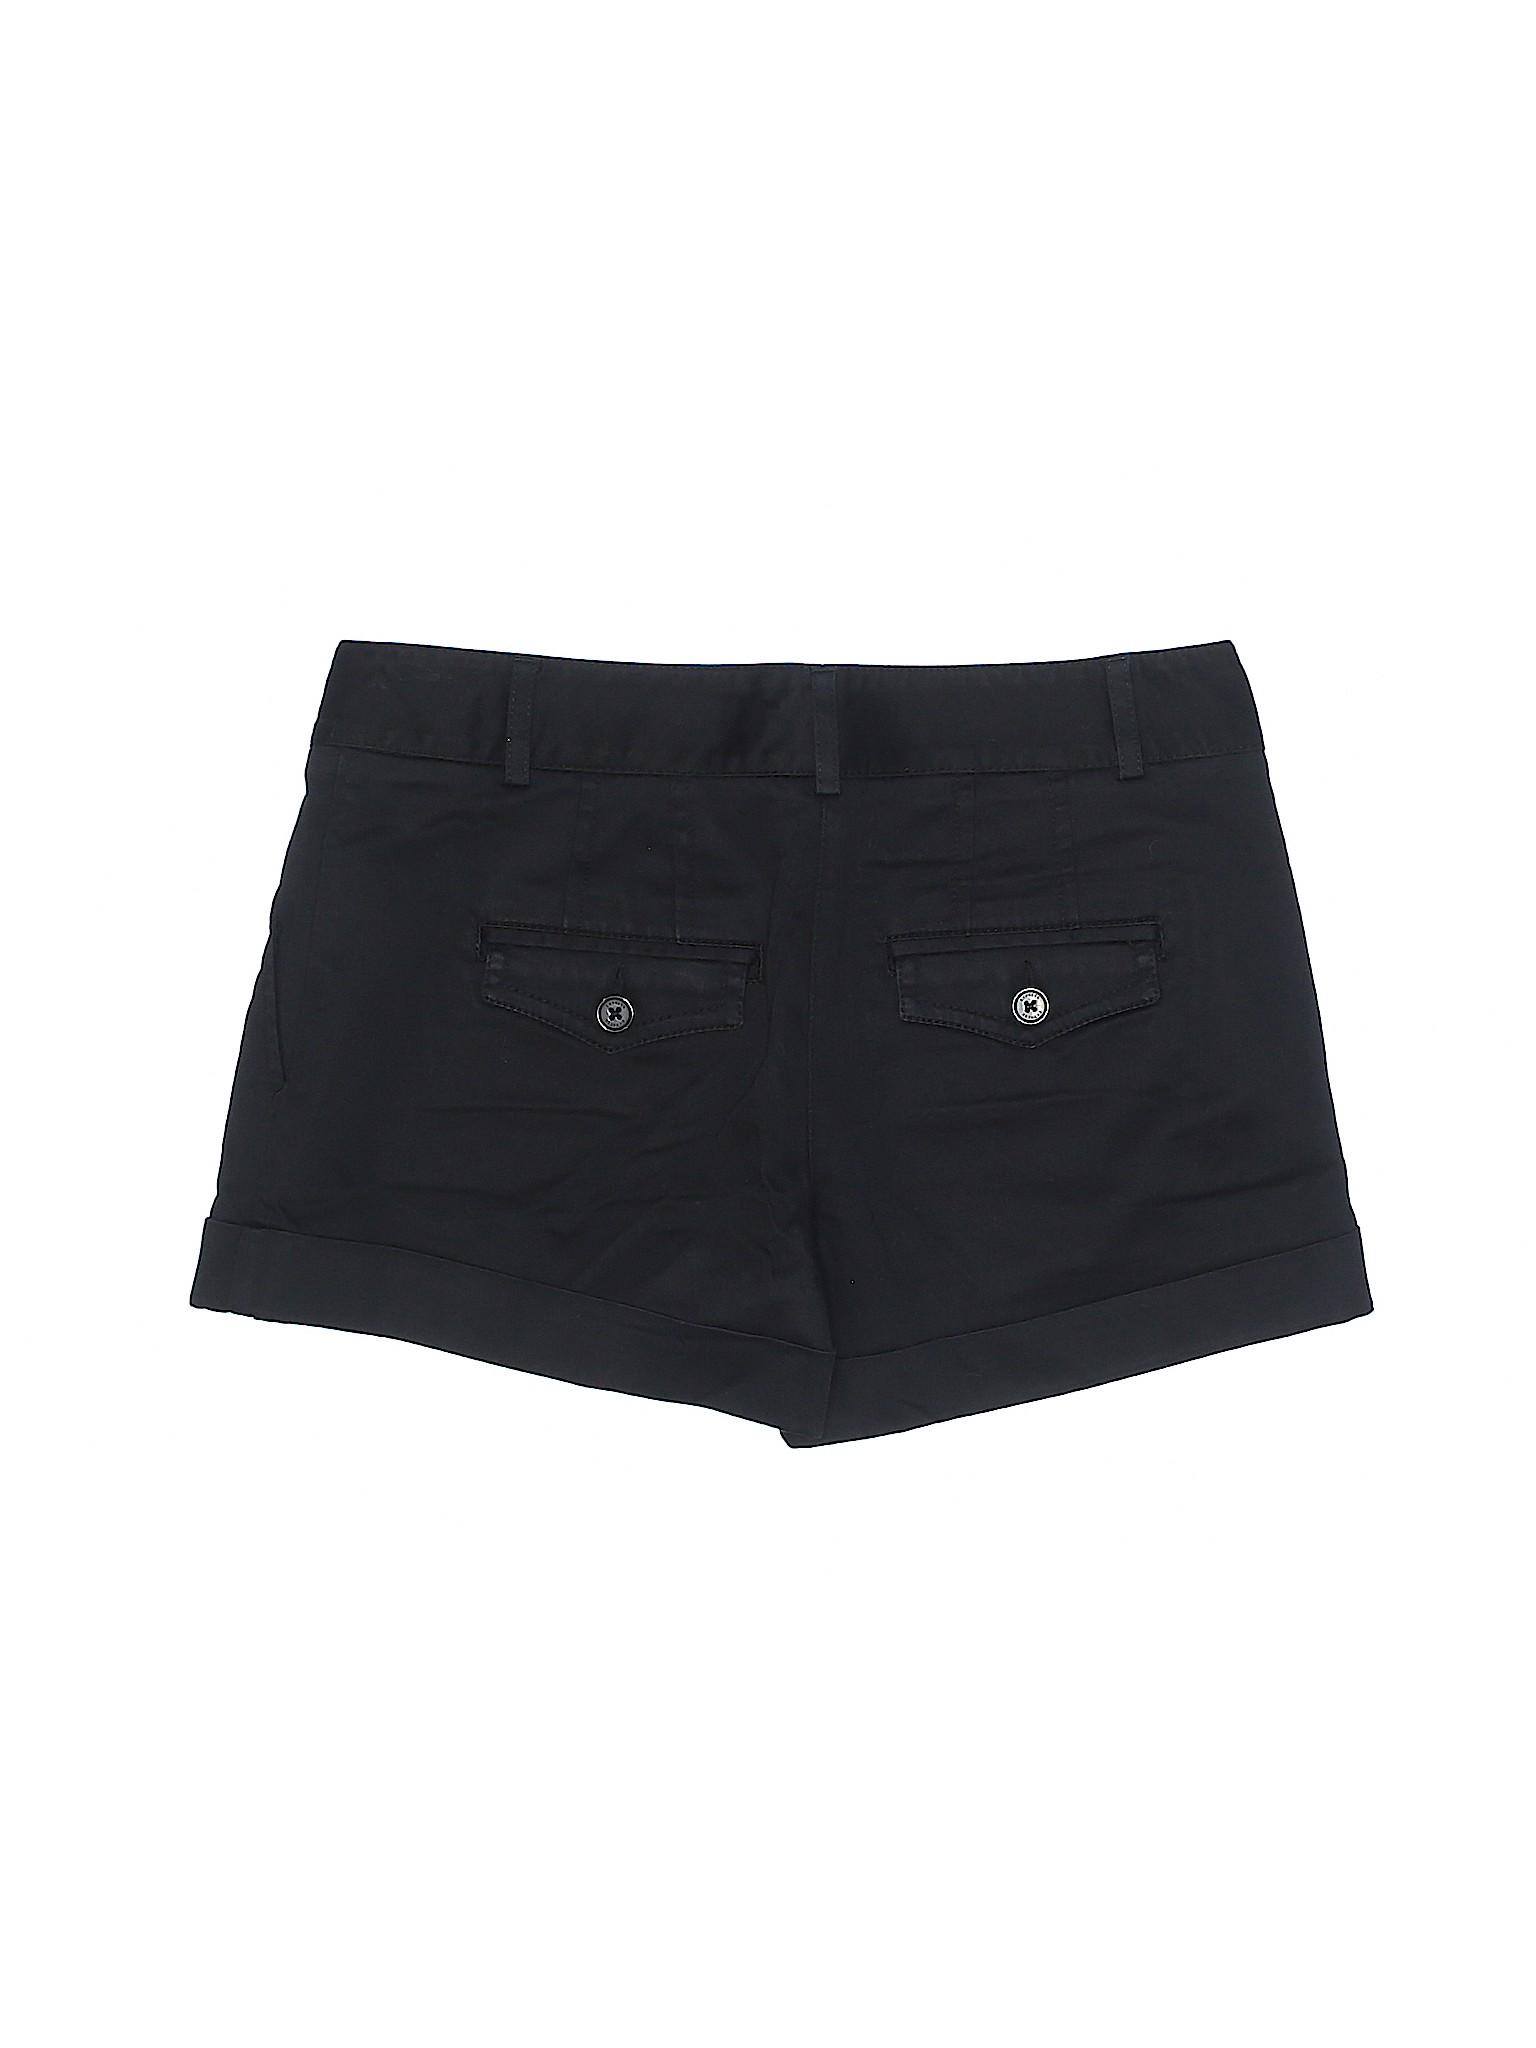 Leisure Leisure winter Express Khaki winter Shorts 0rqvR0w